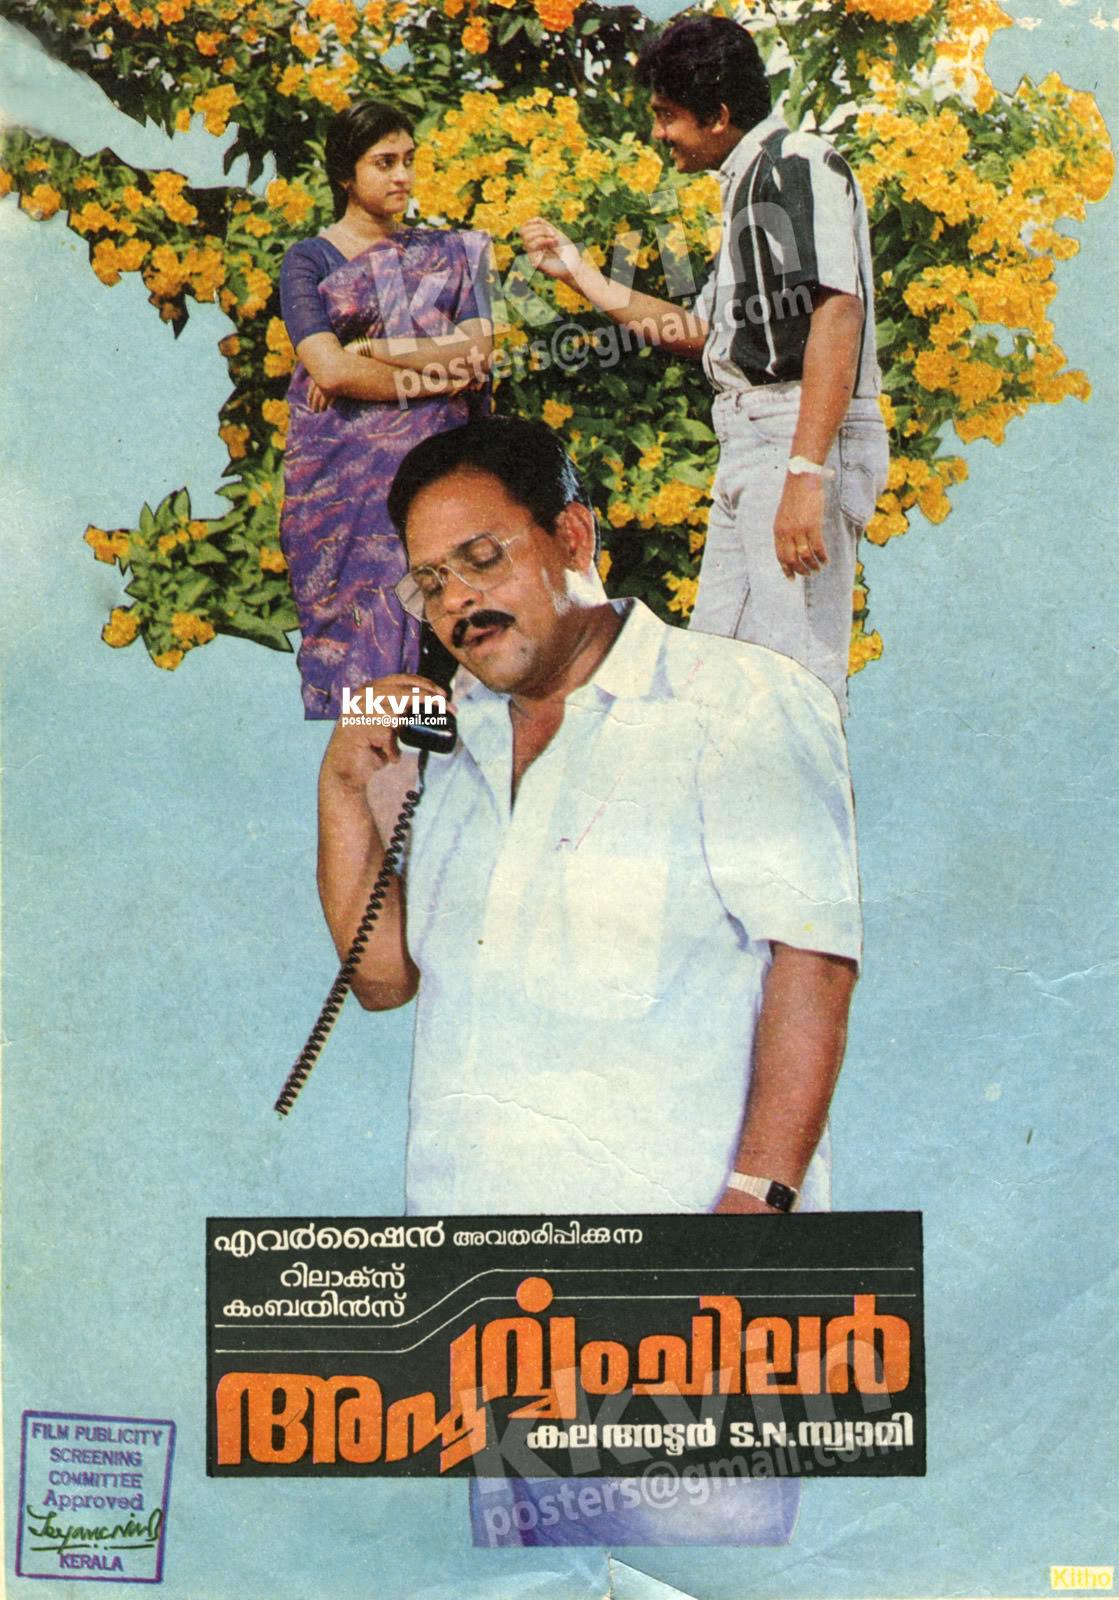 Malayalam movie panchavadi palam online dating